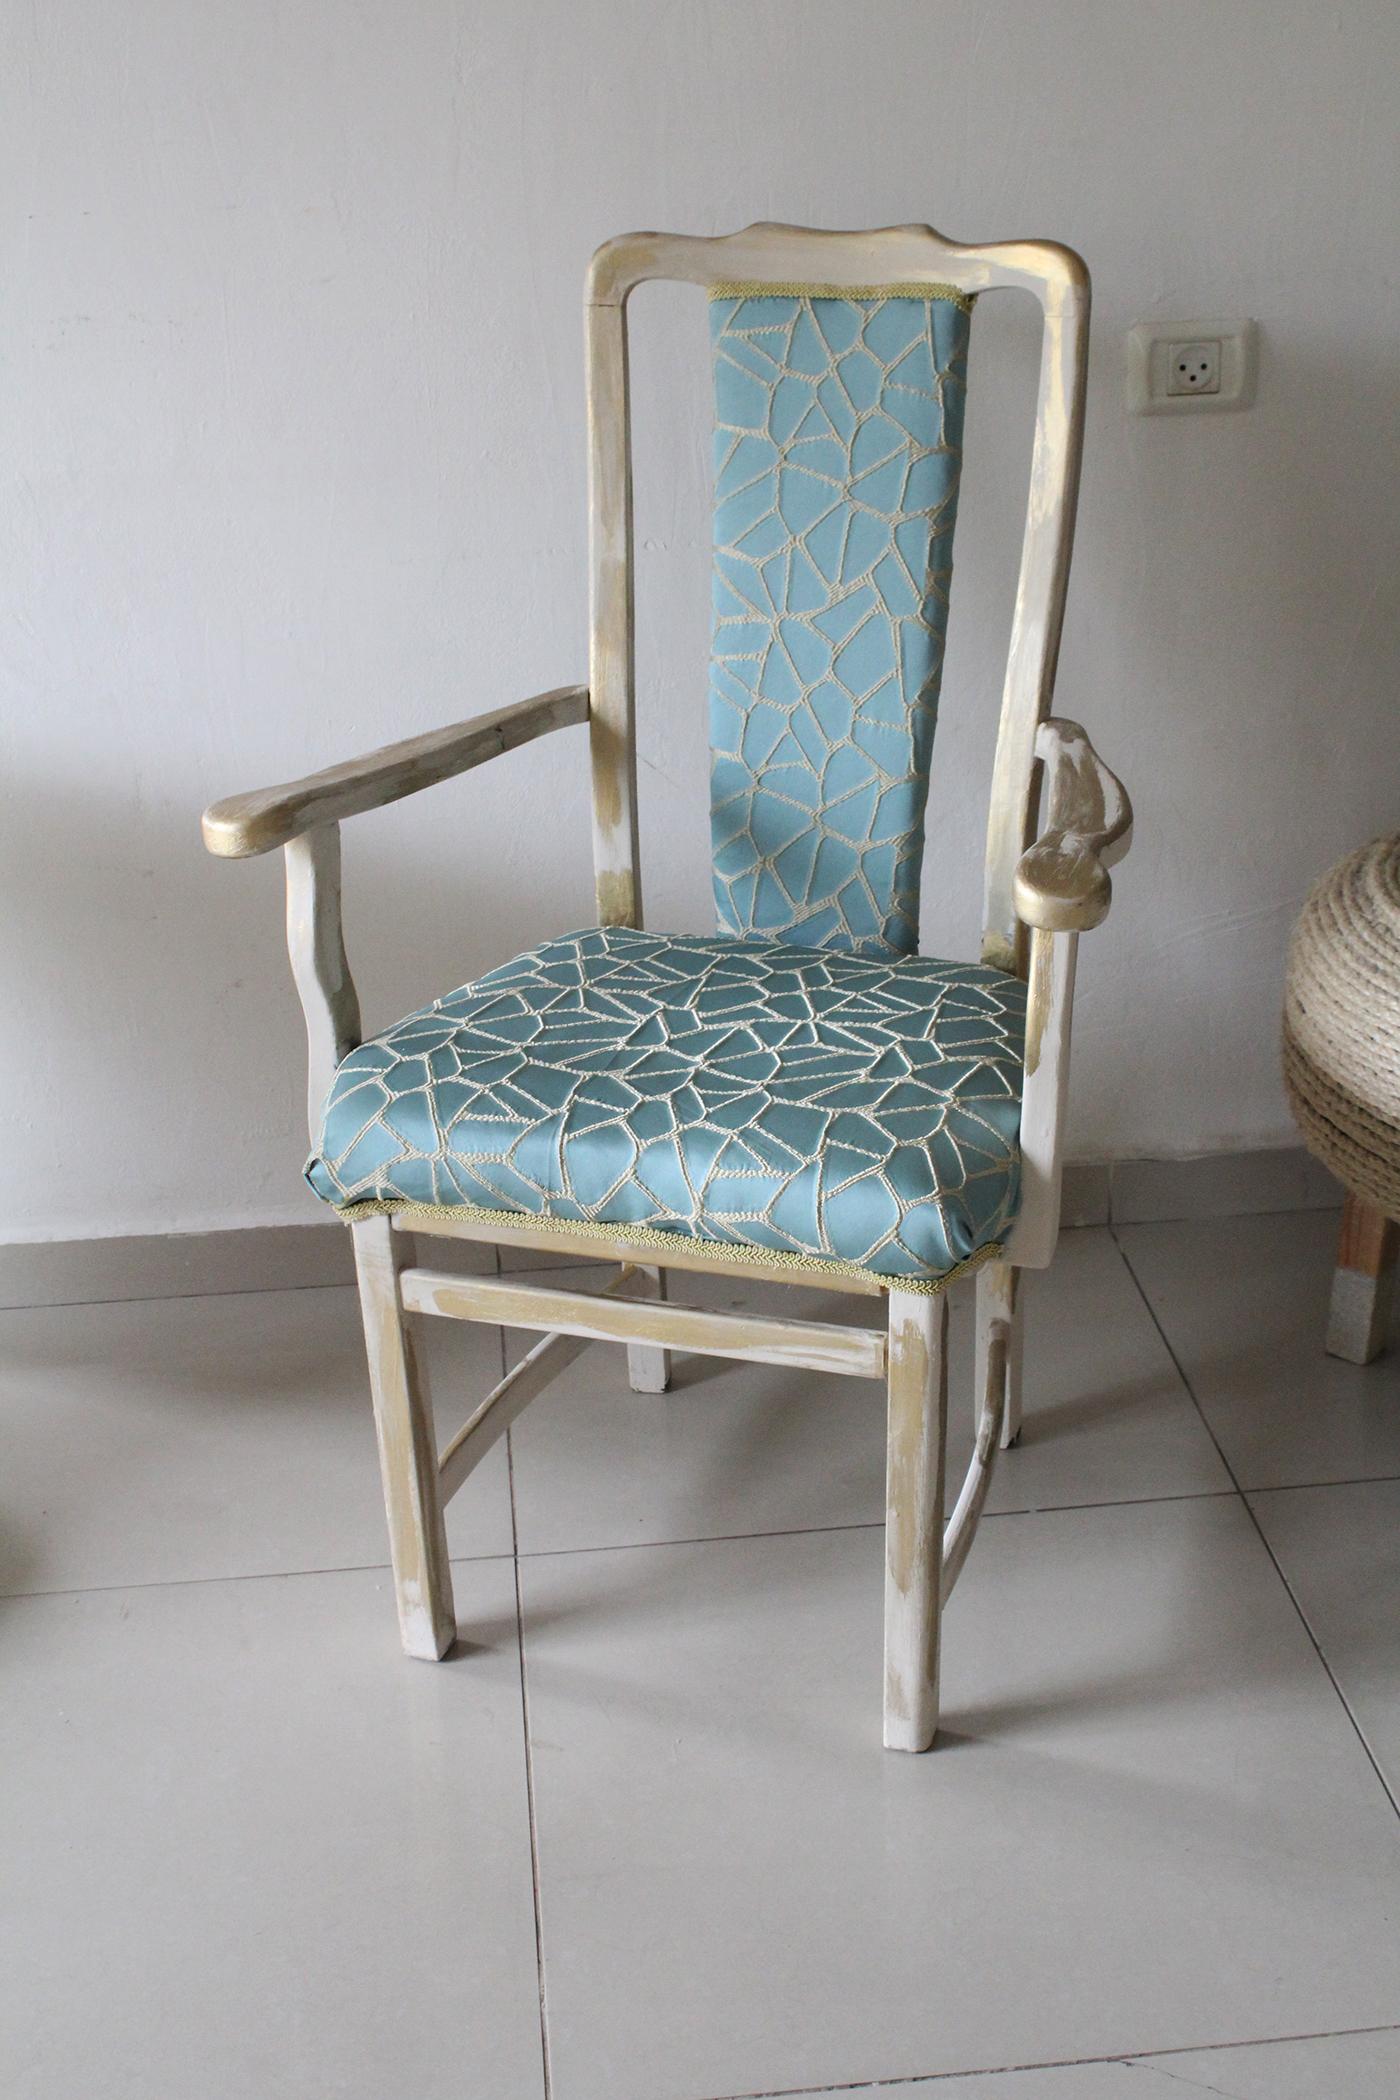 IMG 7657 - חידוש כסא לסט הסלוני